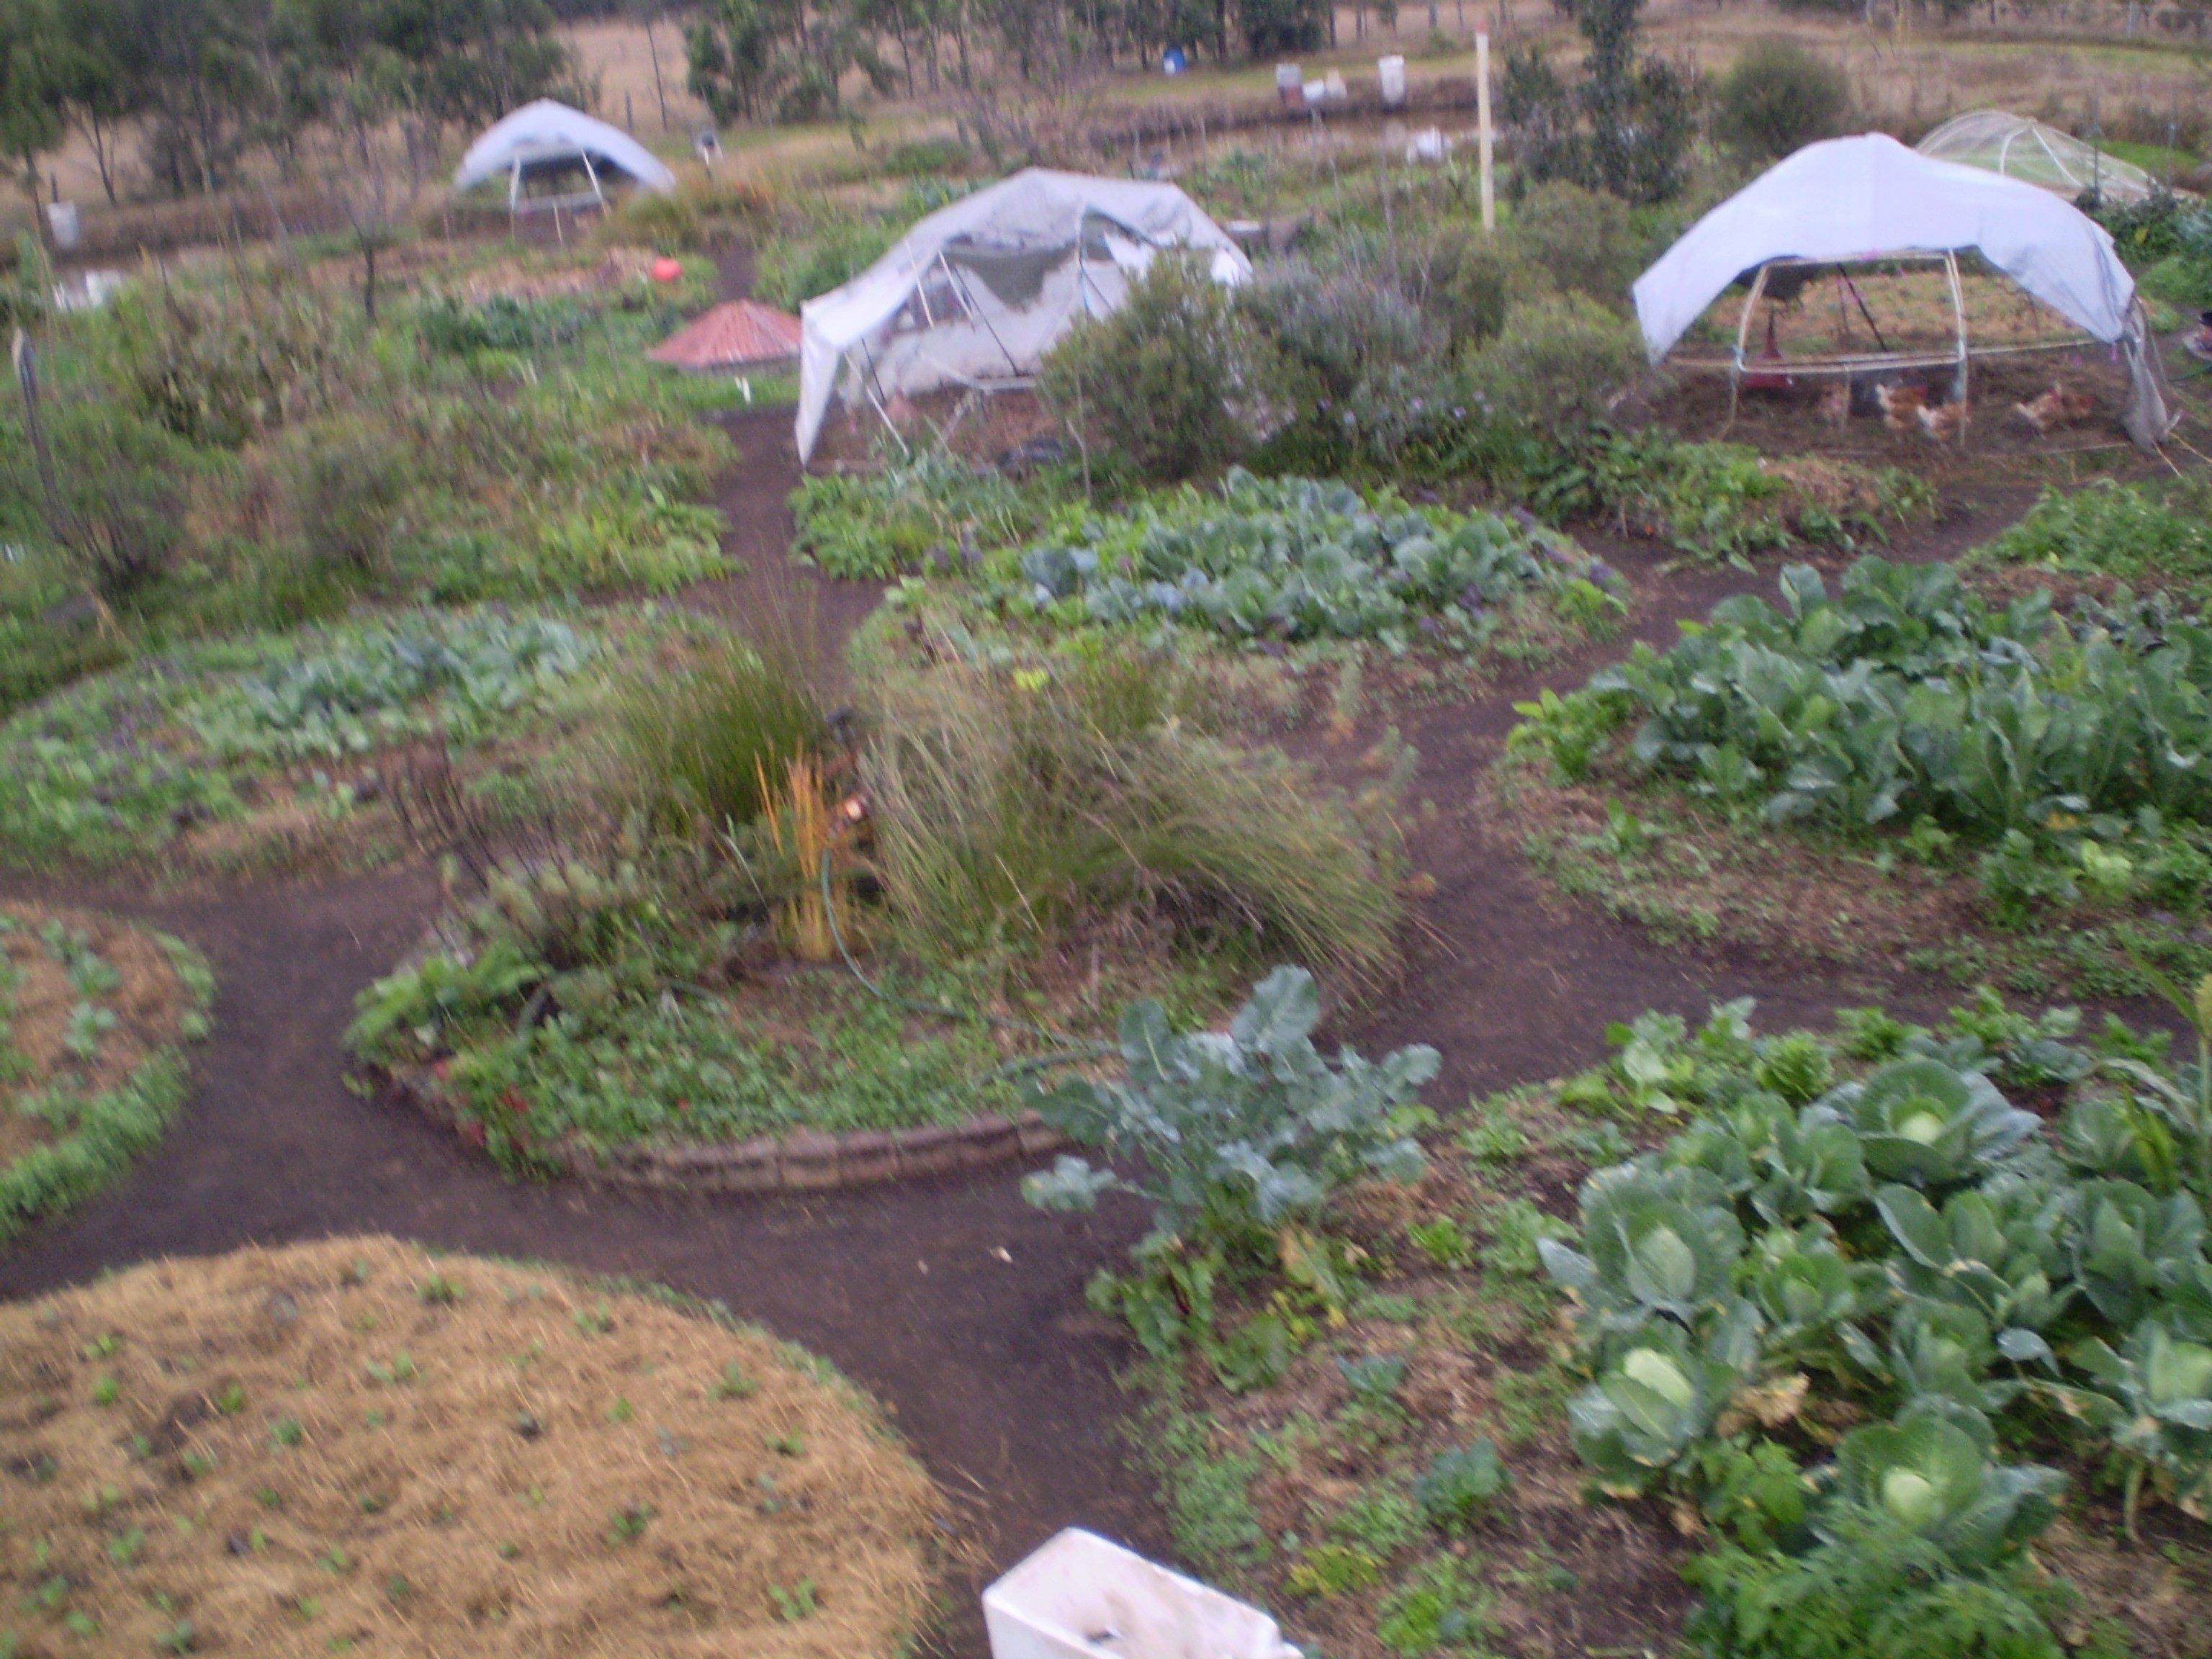 purple pear farm anambah nsw farm practices